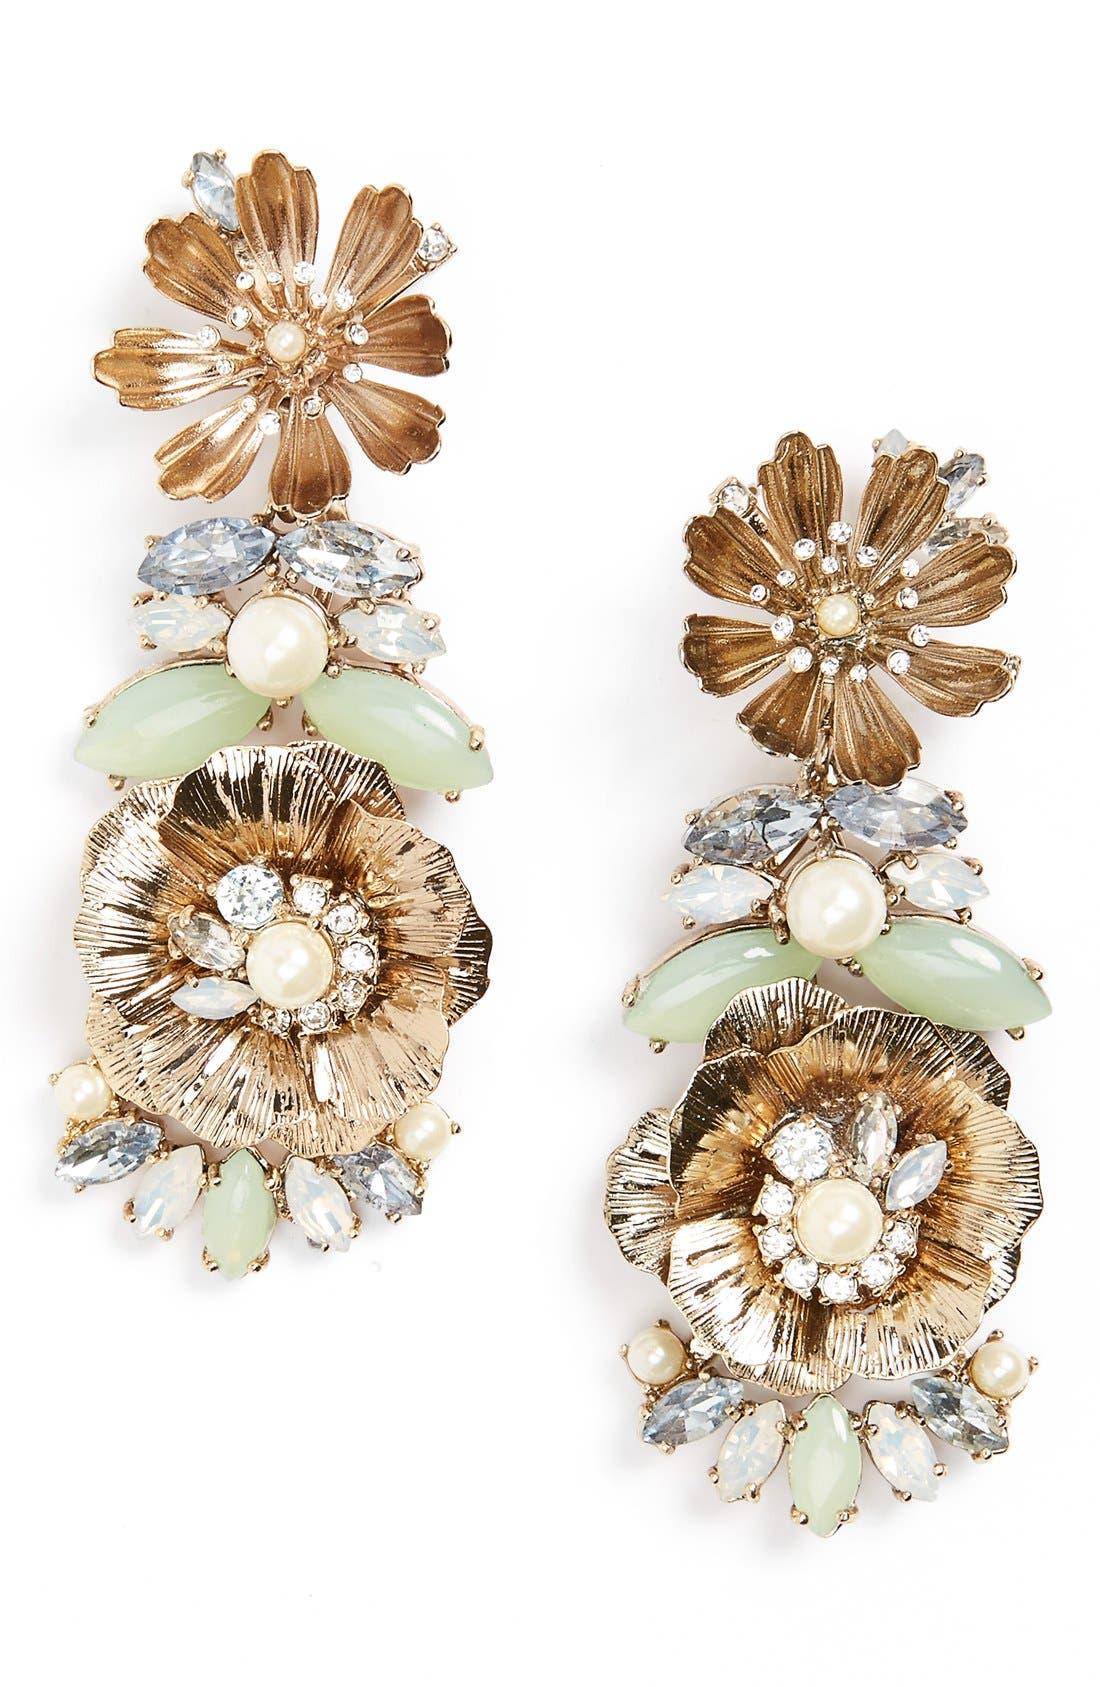 MARCHESA, Crystal Drop Earrings, Main thumbnail 1, color, 440